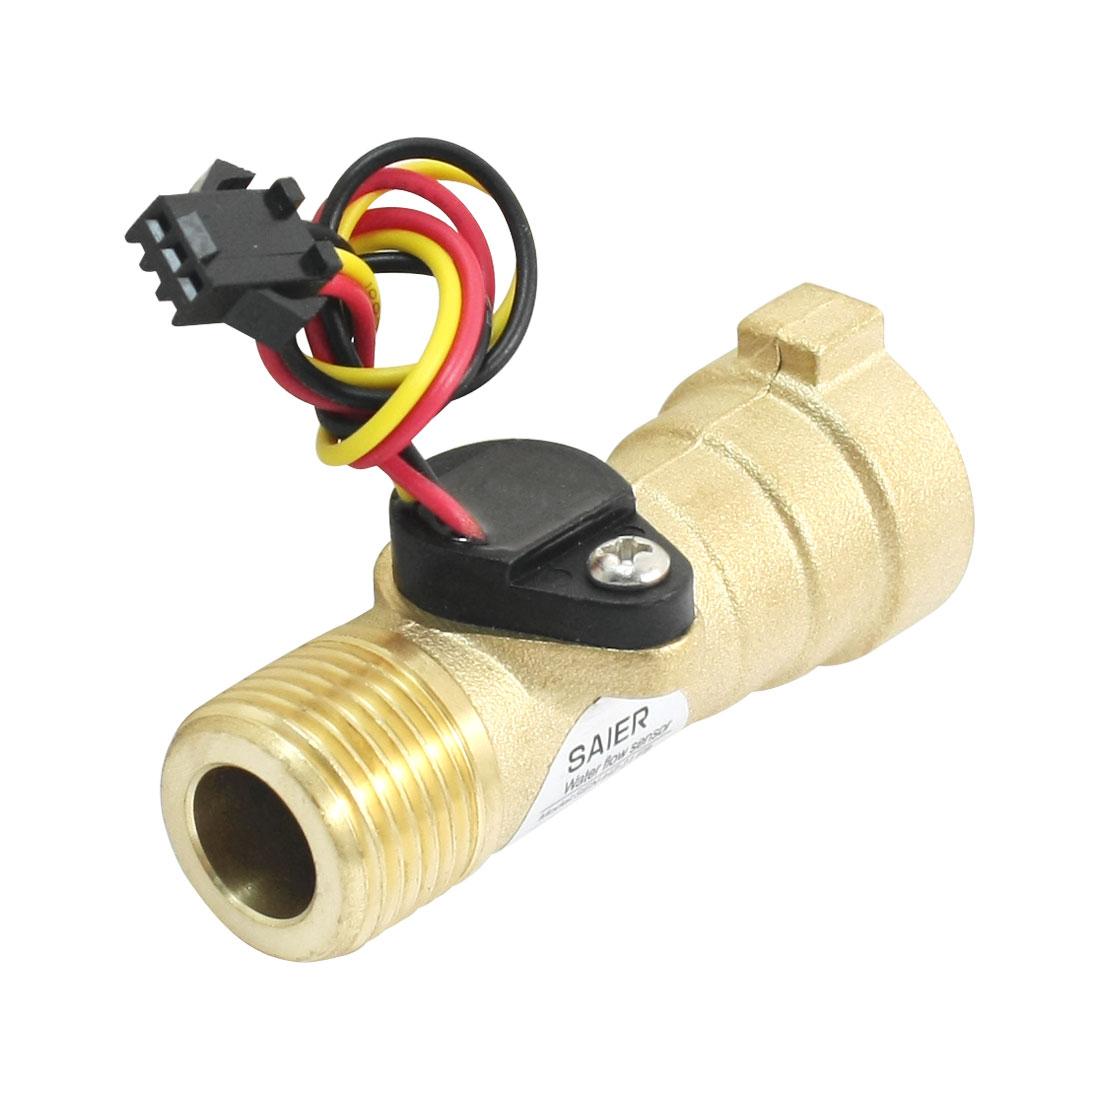 68mm Long M/F G1/2 Thread Port 1-30L/min Hall Effect Water Flow Sensor Flowmeter